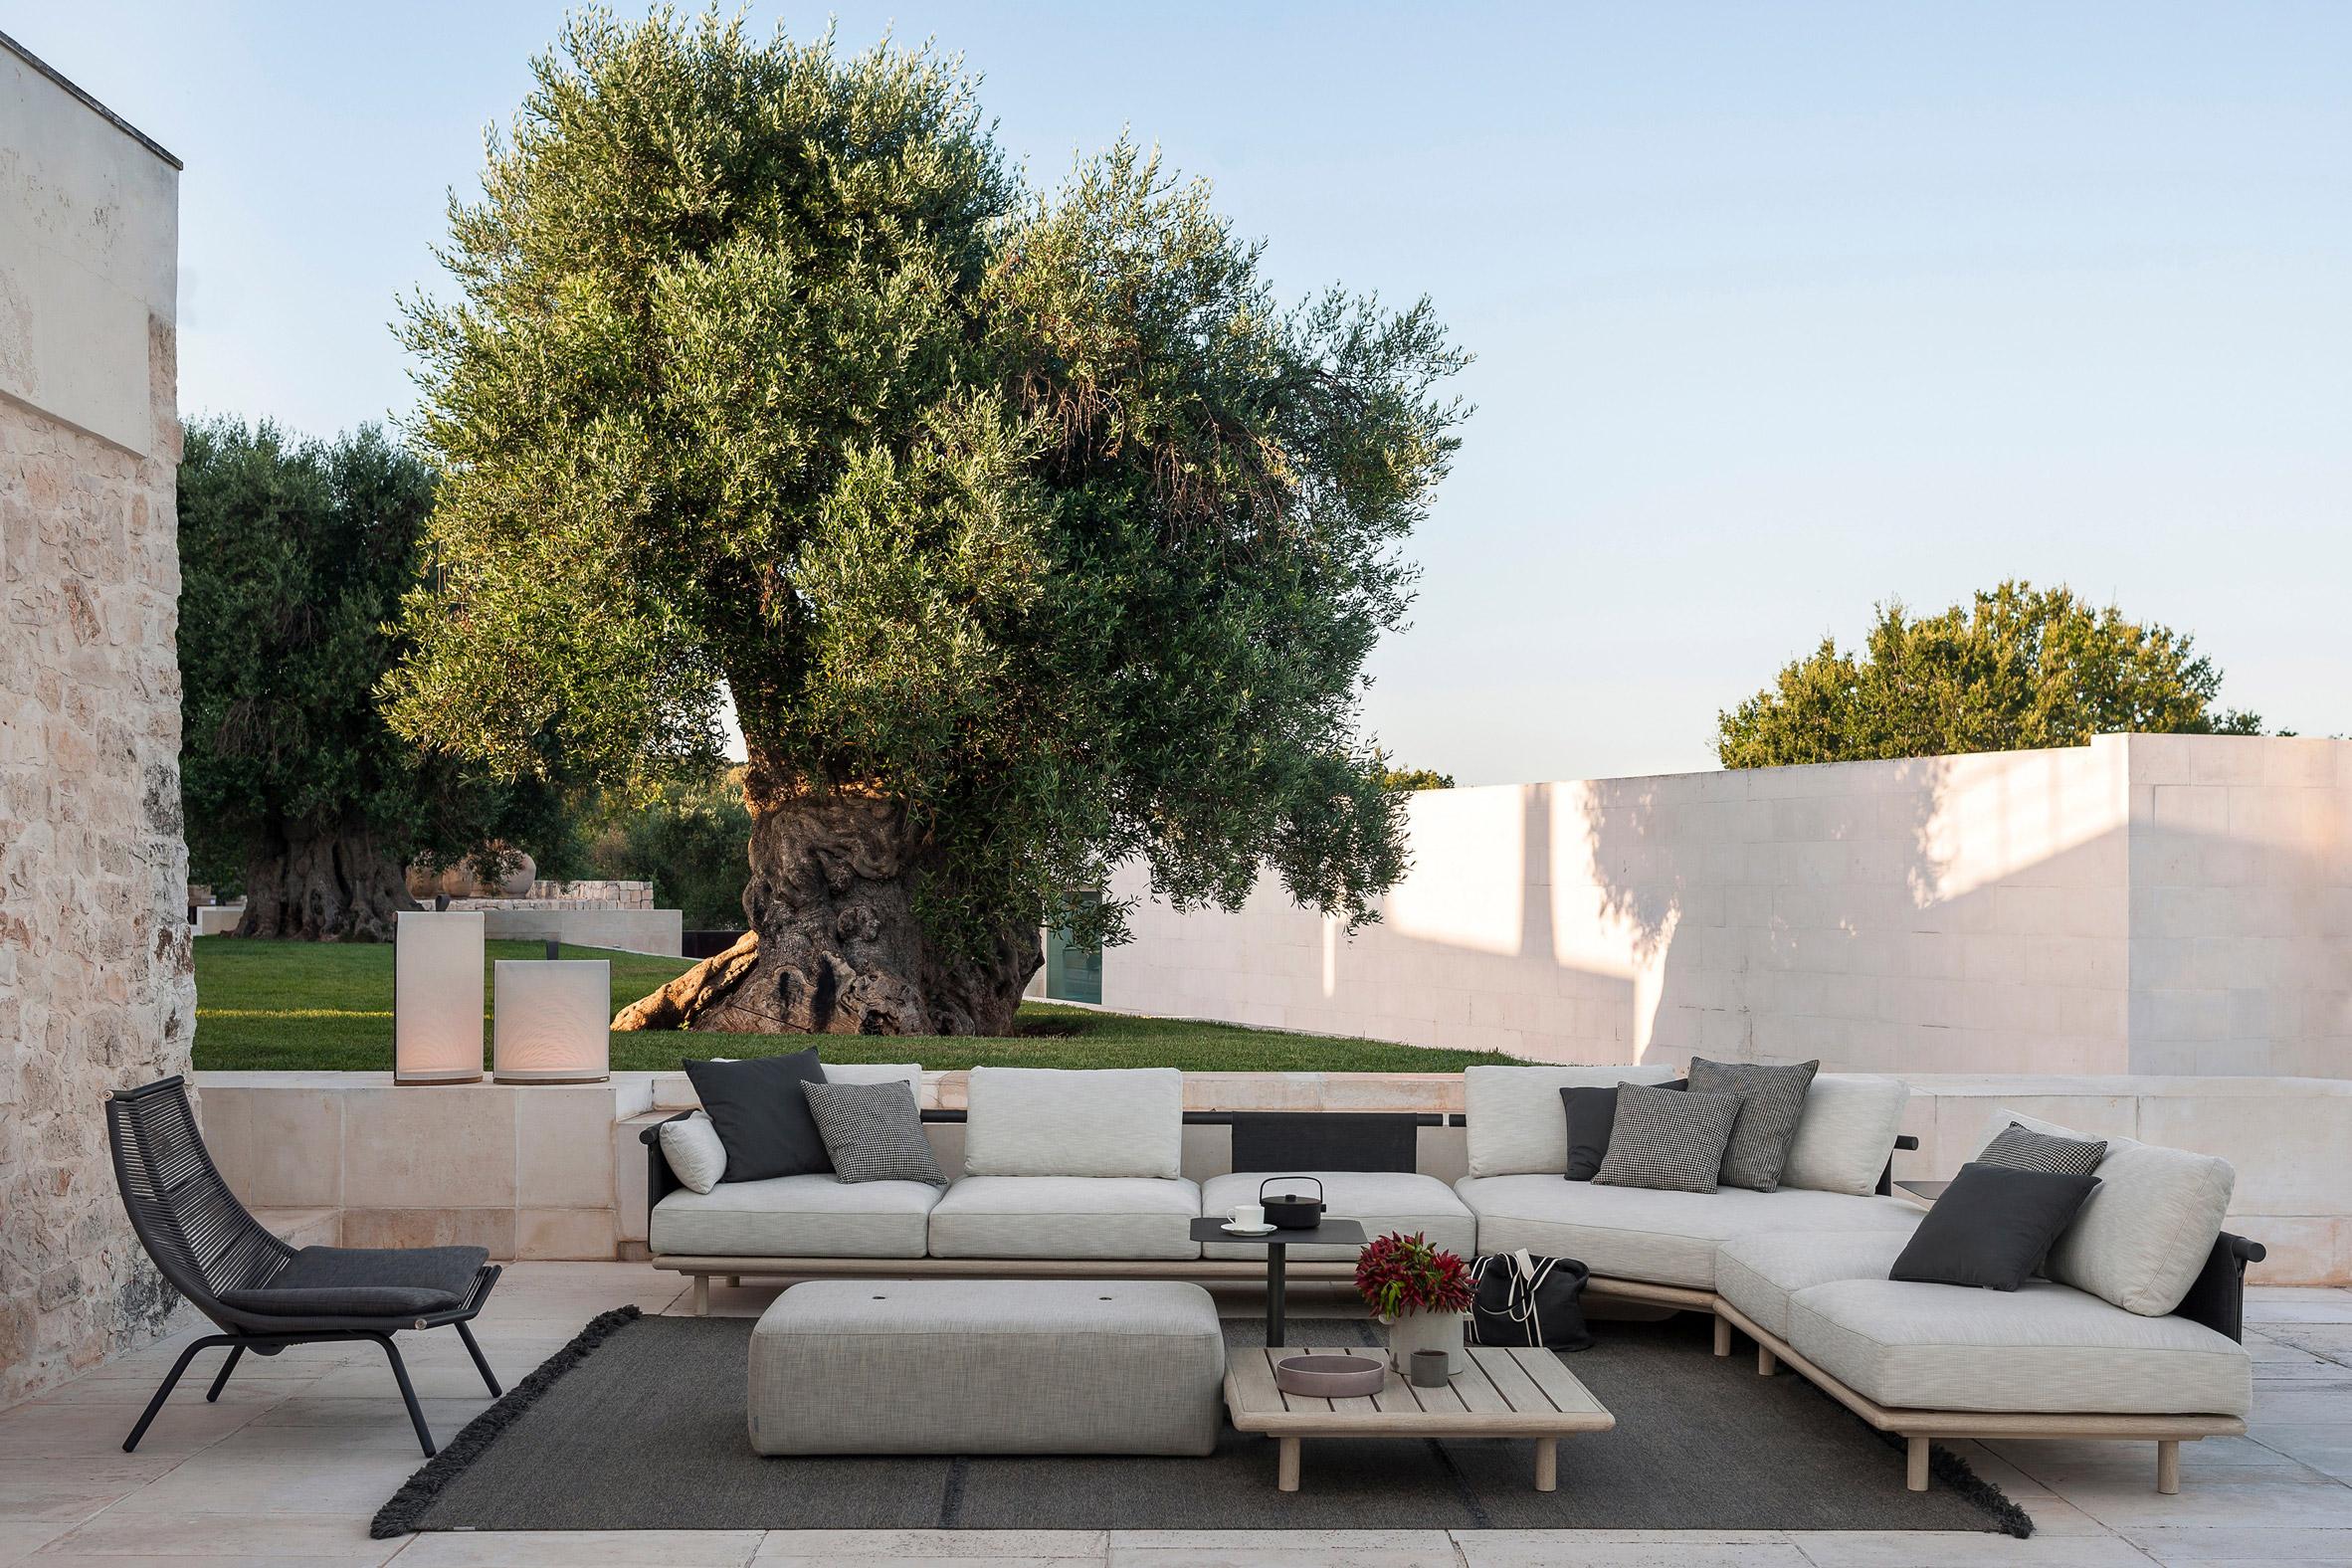 Eden sofa by RODA with teak base